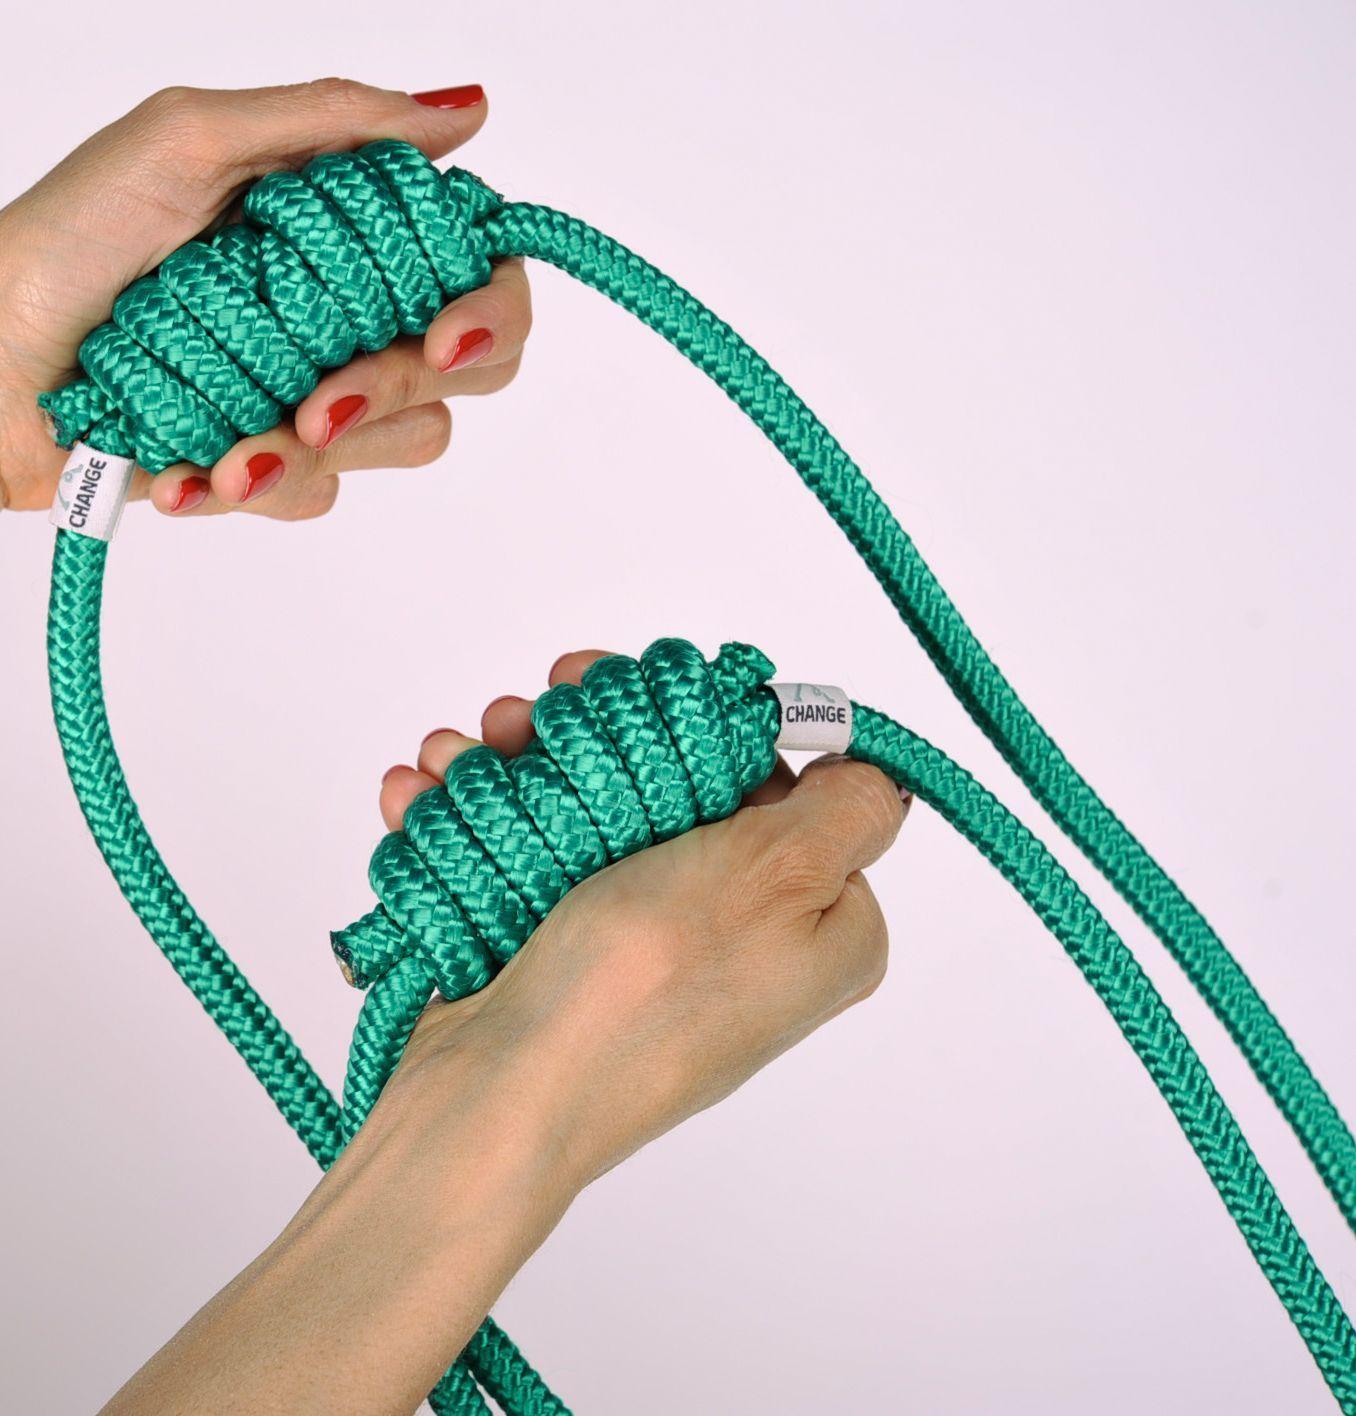 Caproic yoga rope  photo 2